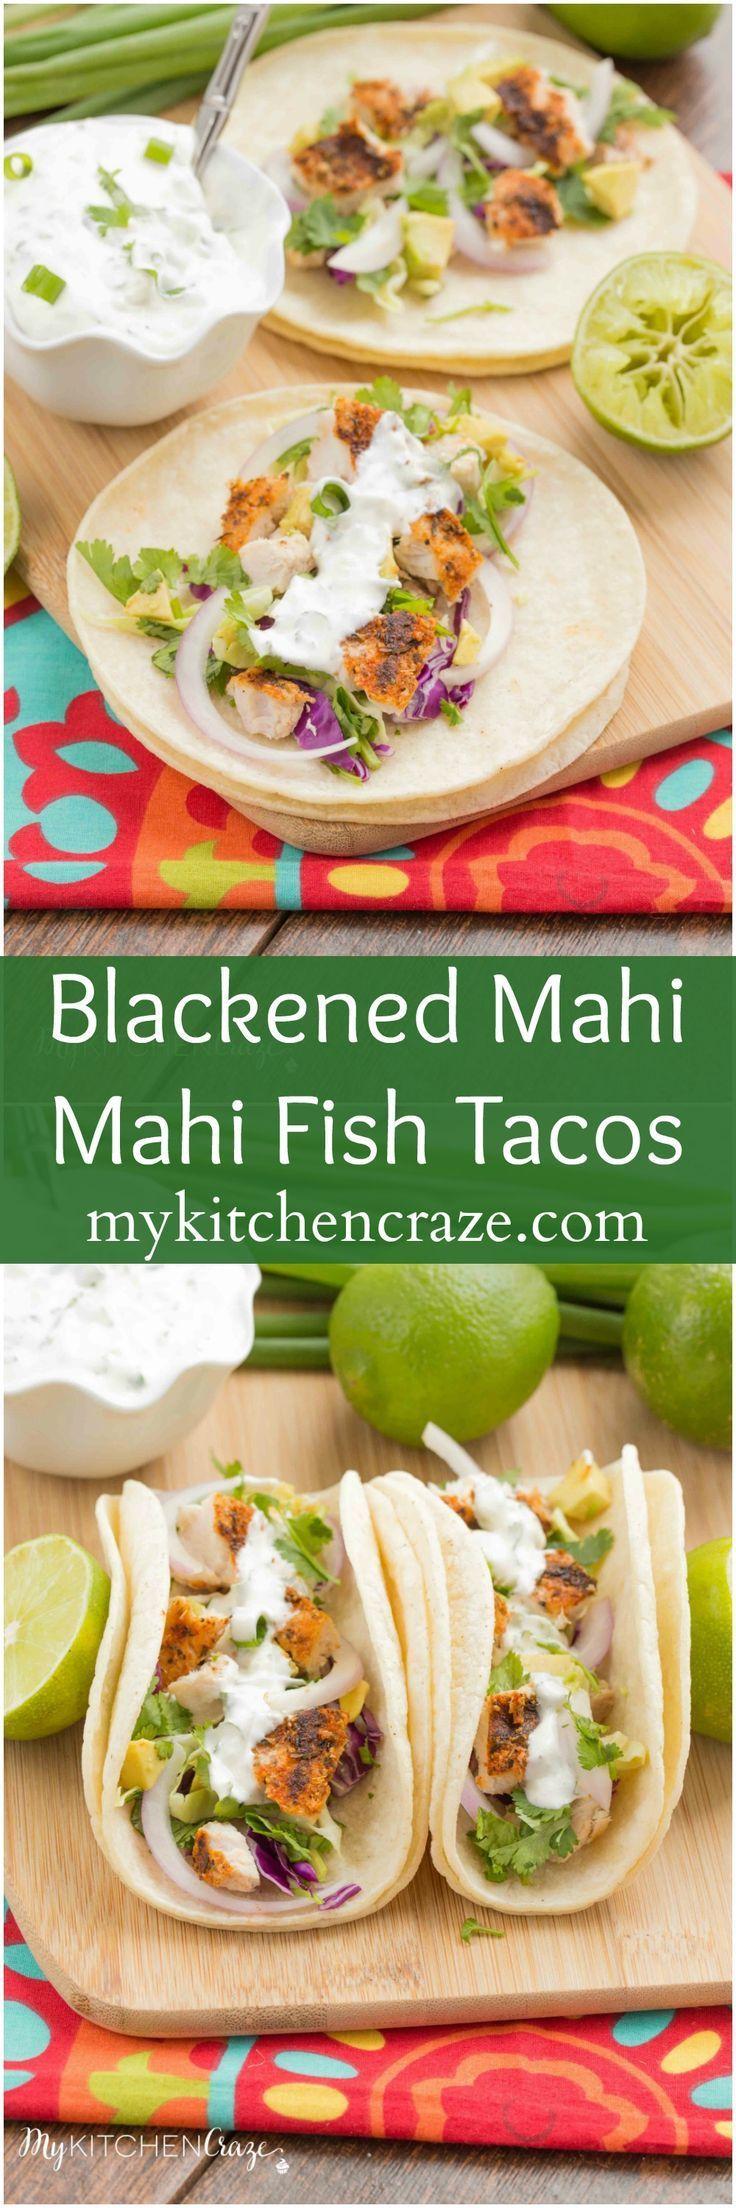 Blackened Mahi Mahi Fish Tacos ~ mykitchencraze.com #seafood #mahimahi #fishtacos #tacos